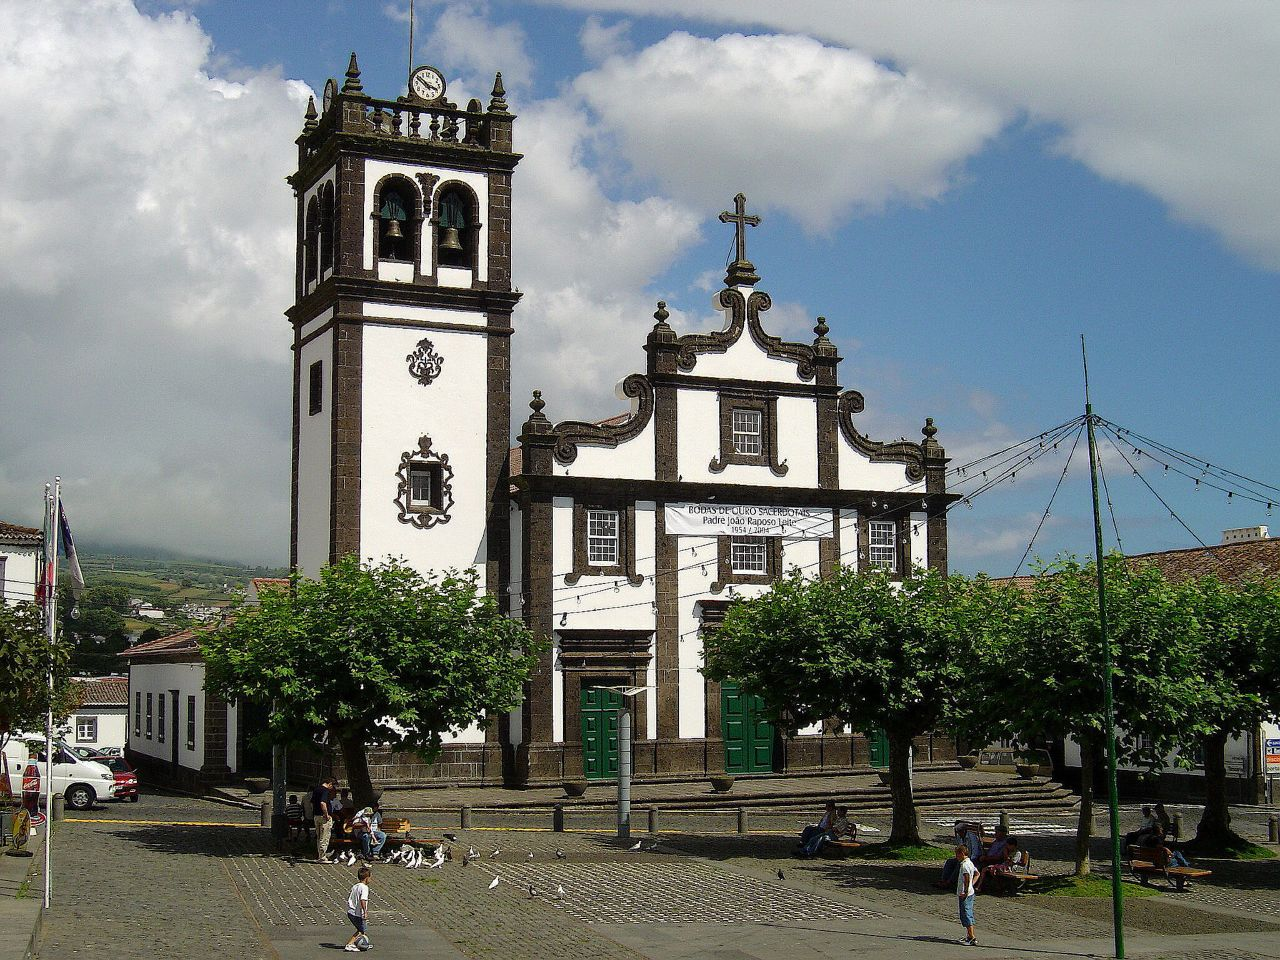 Rosario-Lagoa Portugal  city photos : Original file  1,280 × 960 pixels, file size: 312 KB, MIME type ...